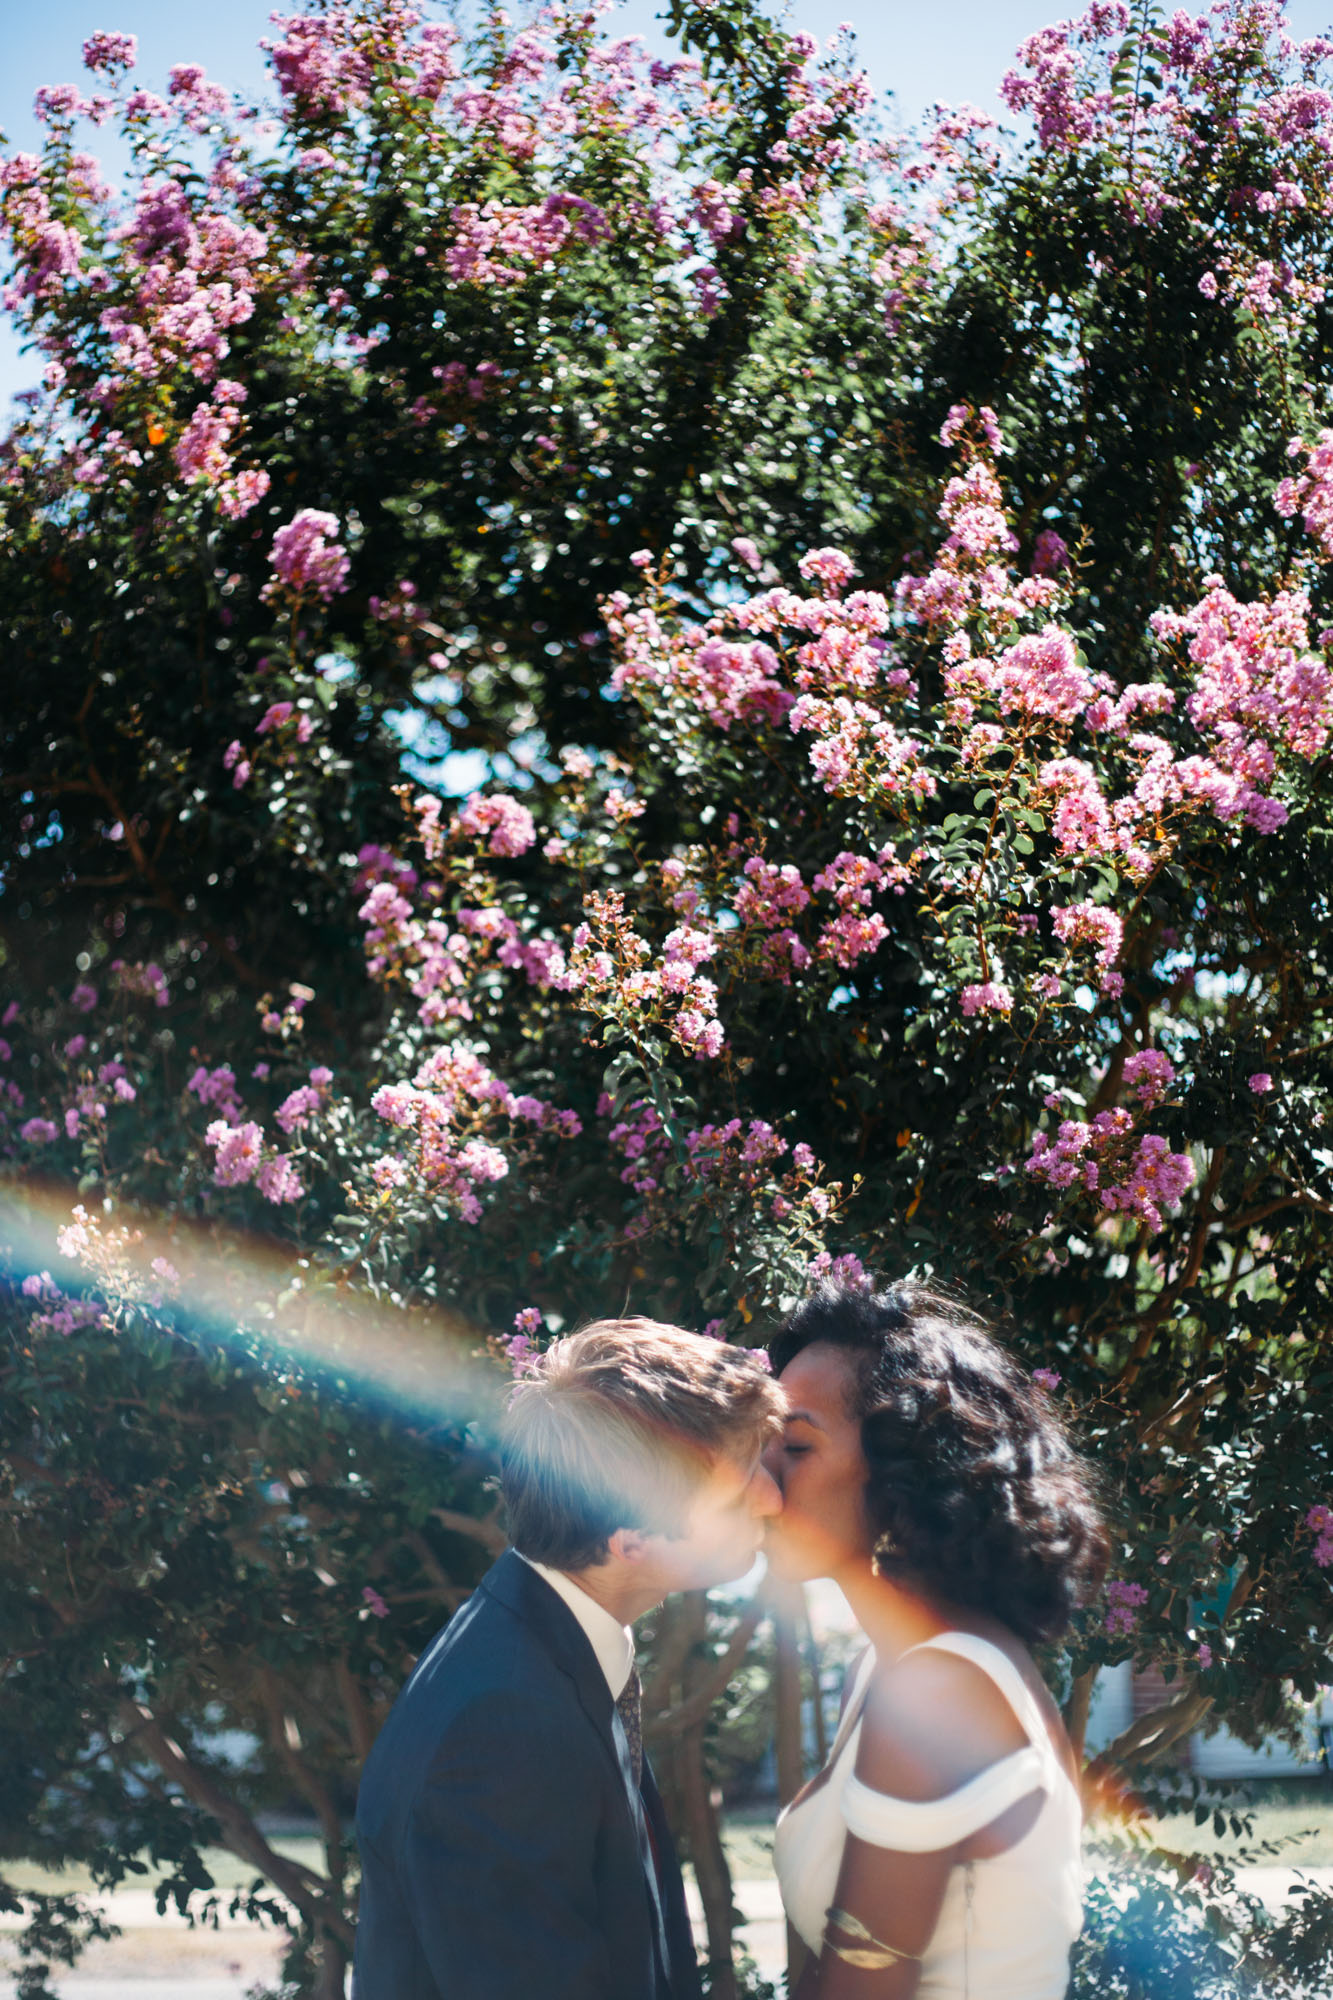 SarahMattozziPhotography-BackyardWedding-ColonialBeachVirginia-12.jpg